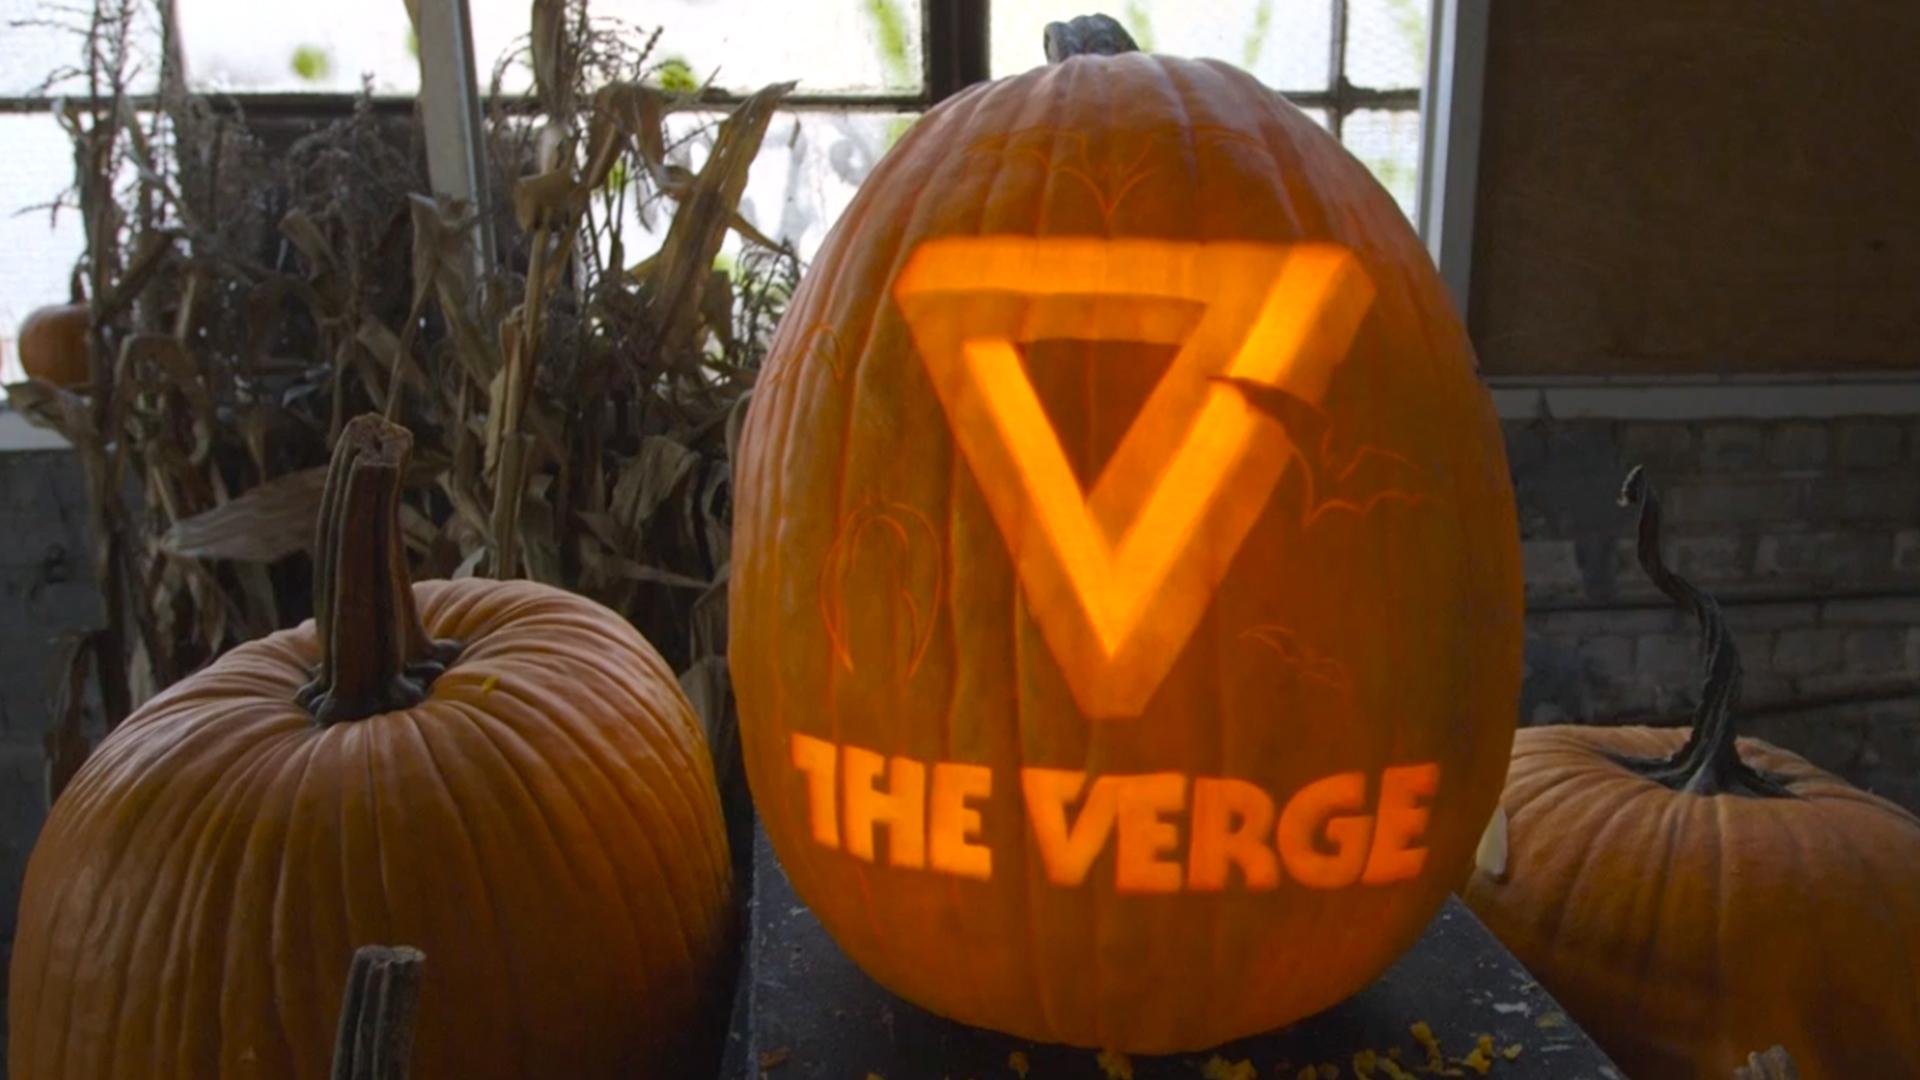 verge pumpkin